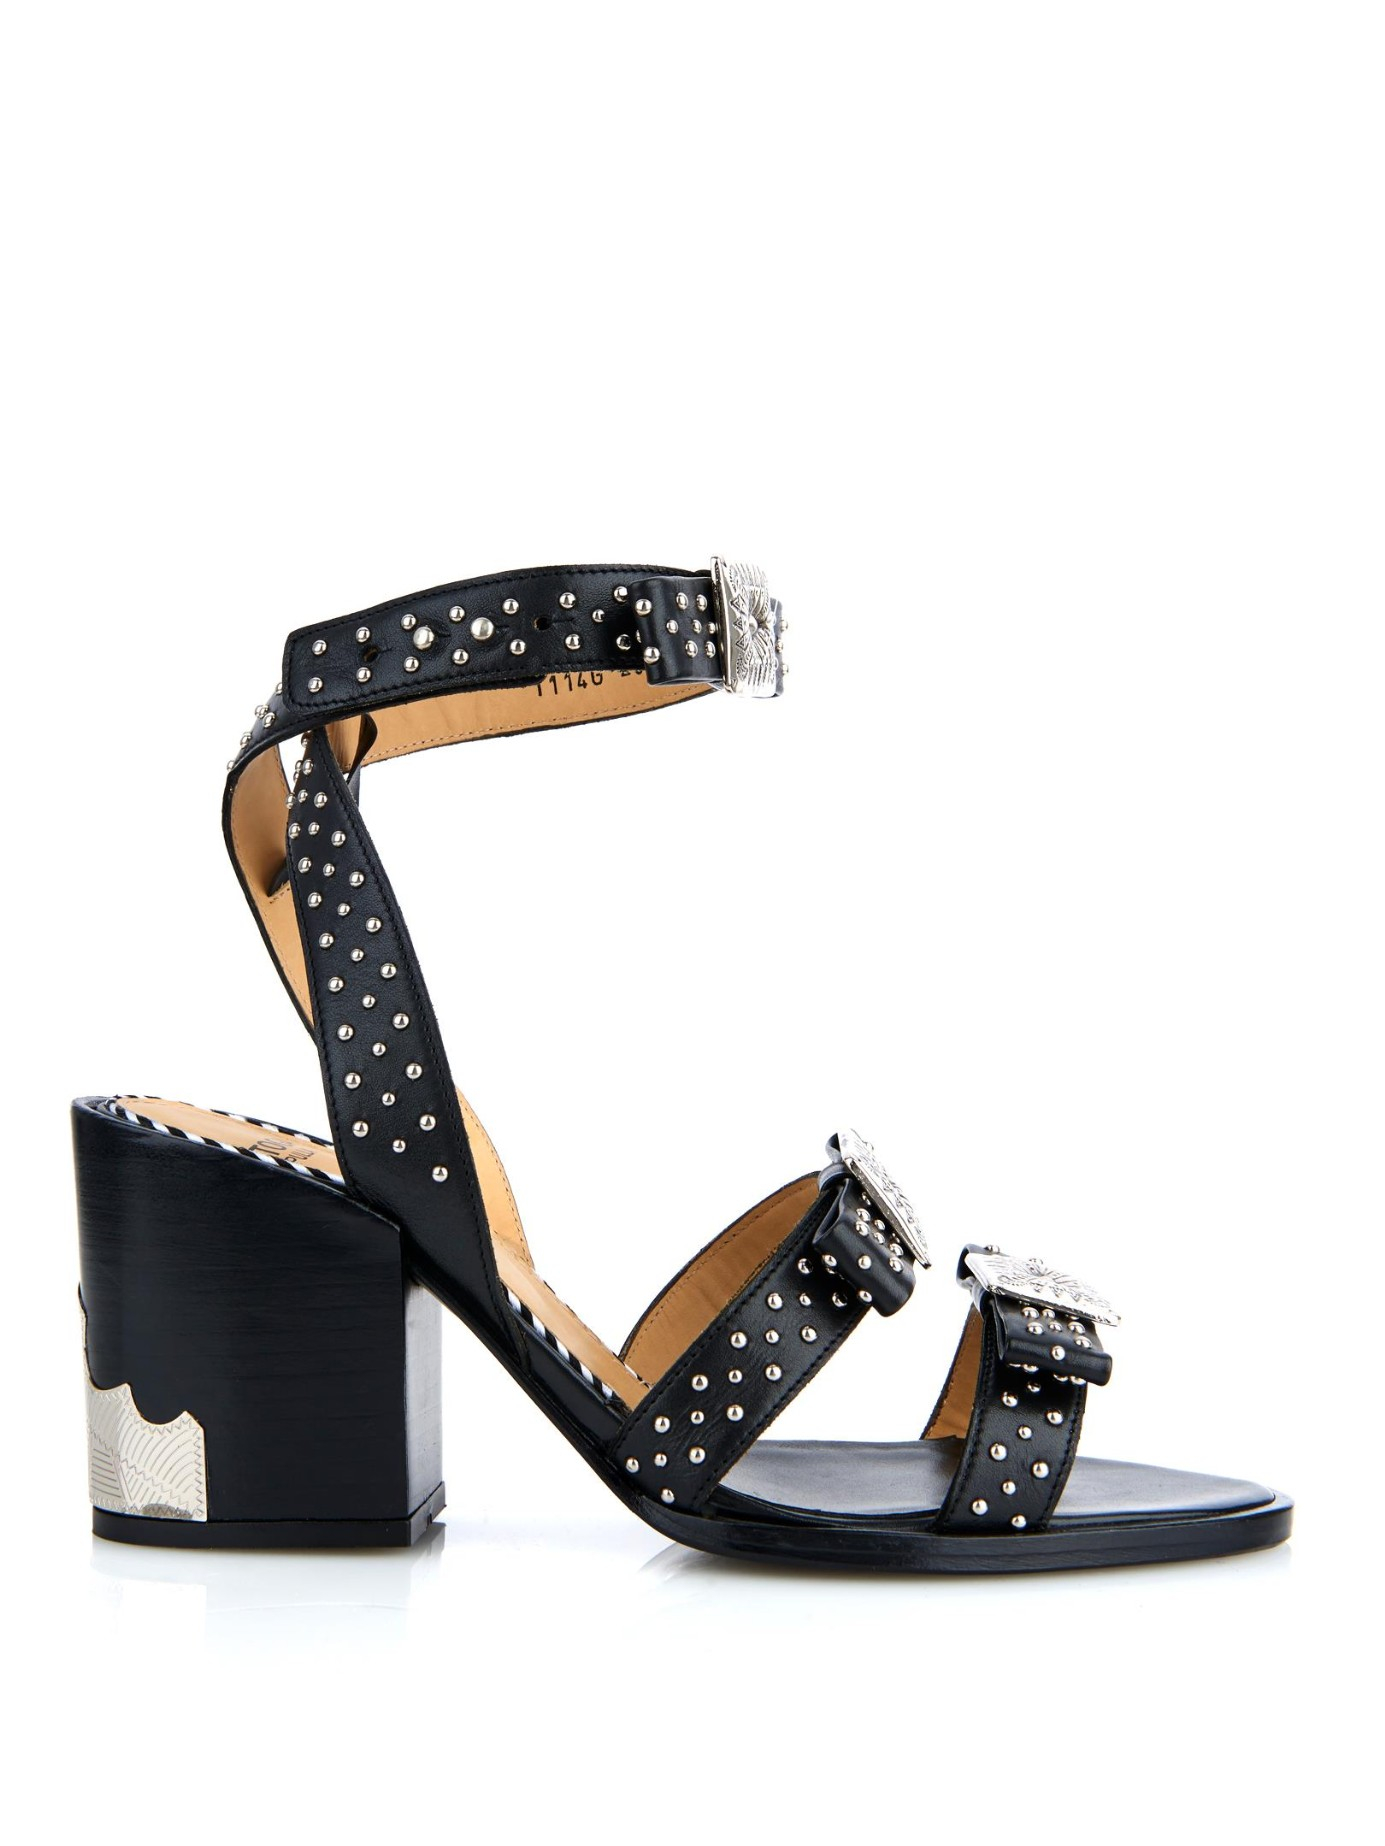 e612dea3d922 Toga Studded Leather Block-Heel Sandals in Black - Lyst